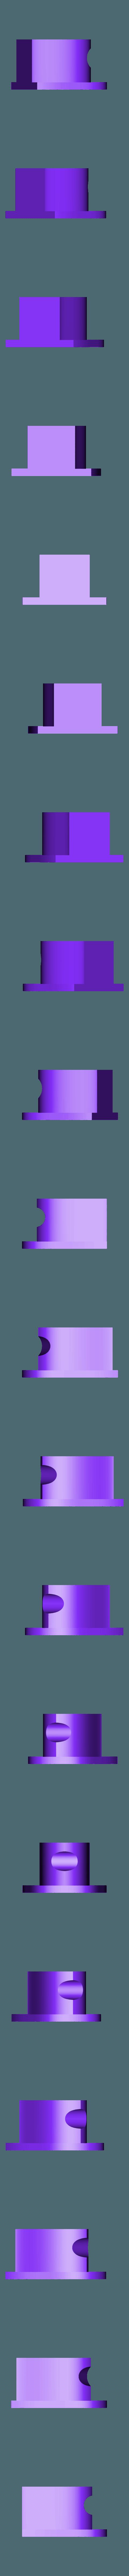 "2.stl Download free STL file ""Knobs"" for ProFab Mini Fan Shroud • 3D printing object, Domi1988"